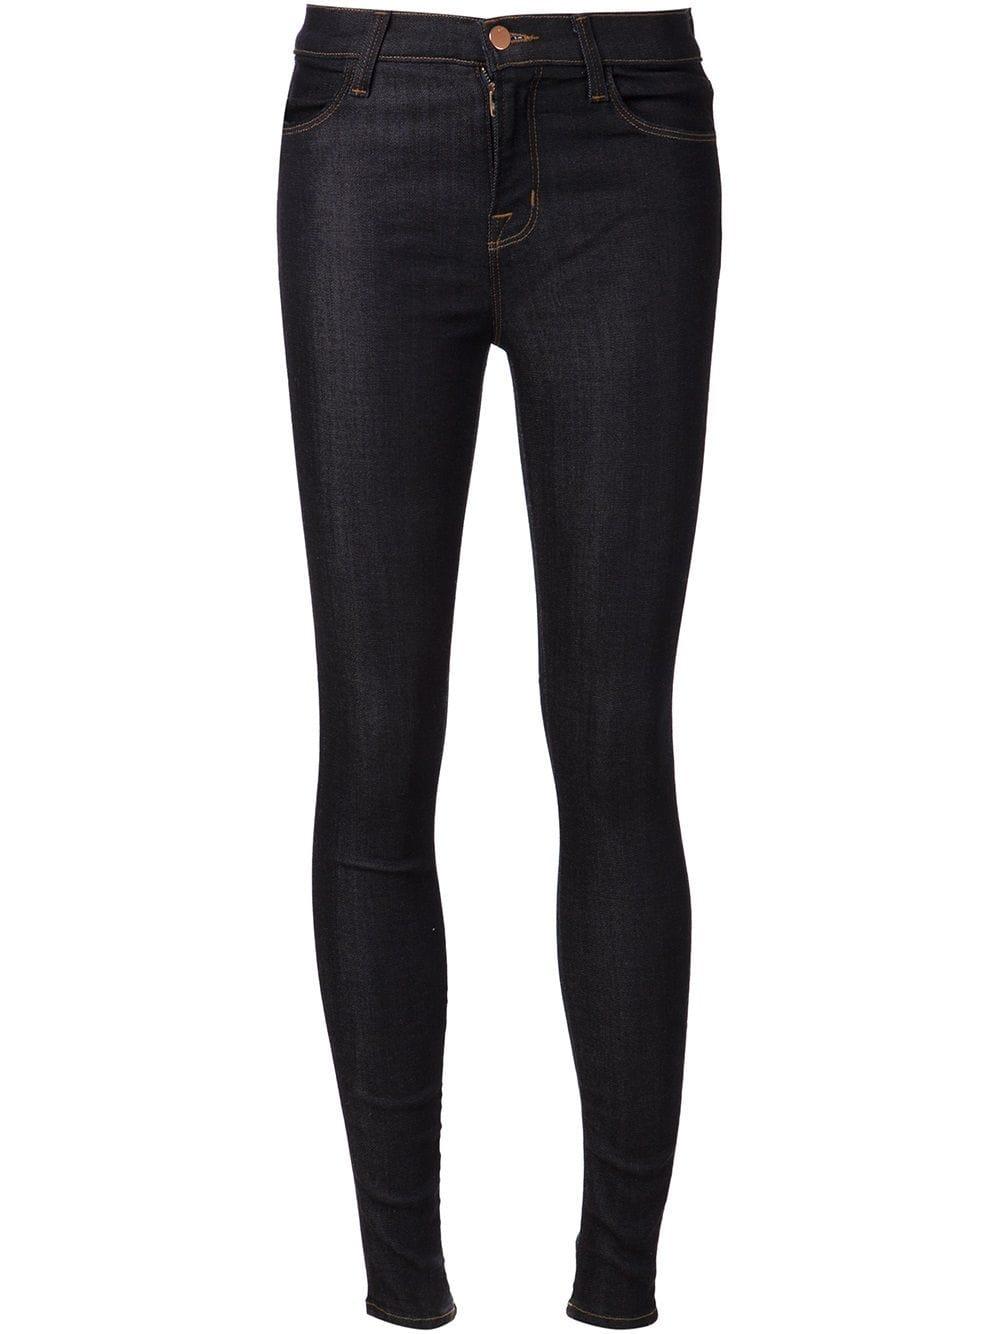 J BRAND J BRAND | Jeans | 23110O208BAFTERDARK